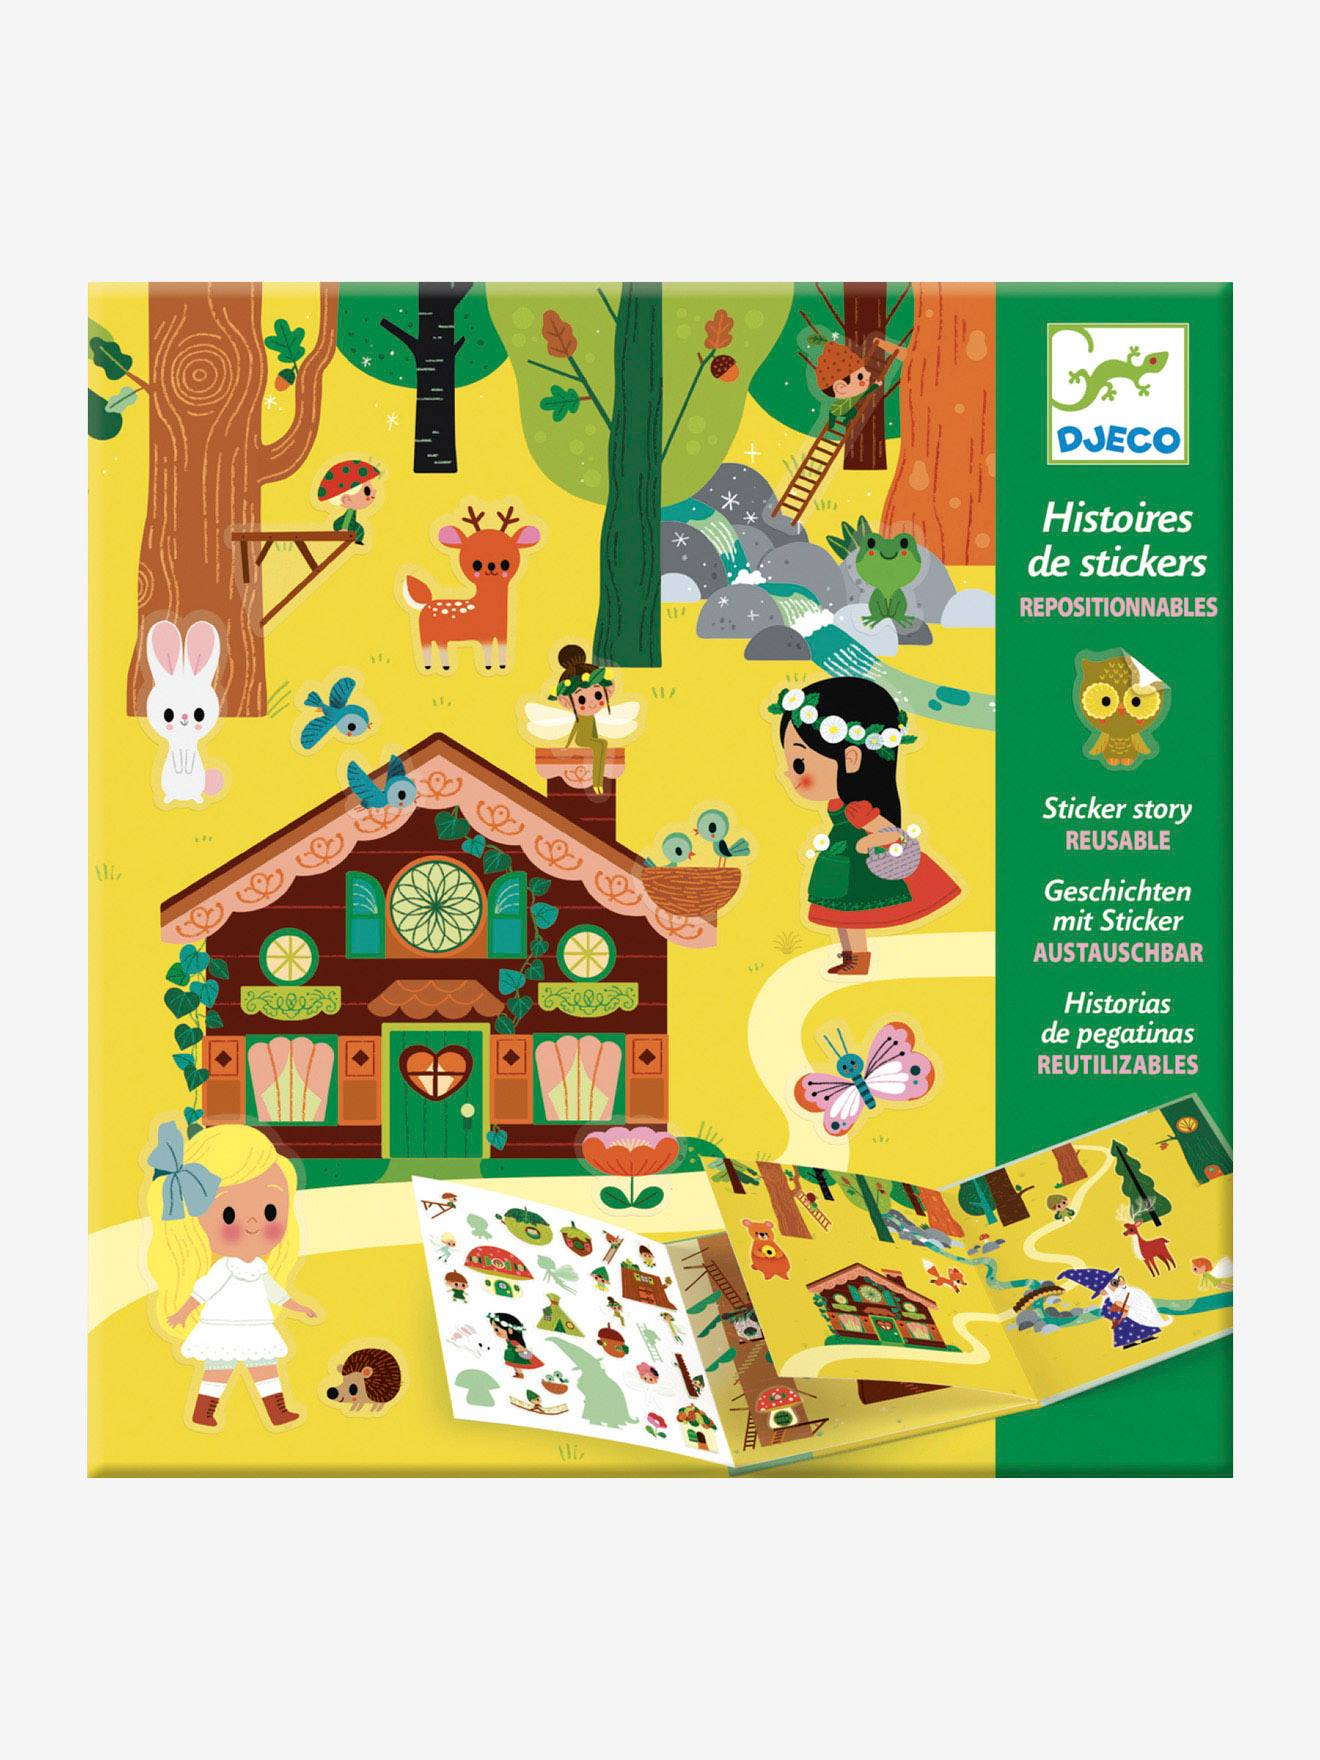 Stickers repositionnables La forêt magique DJECO multicolore